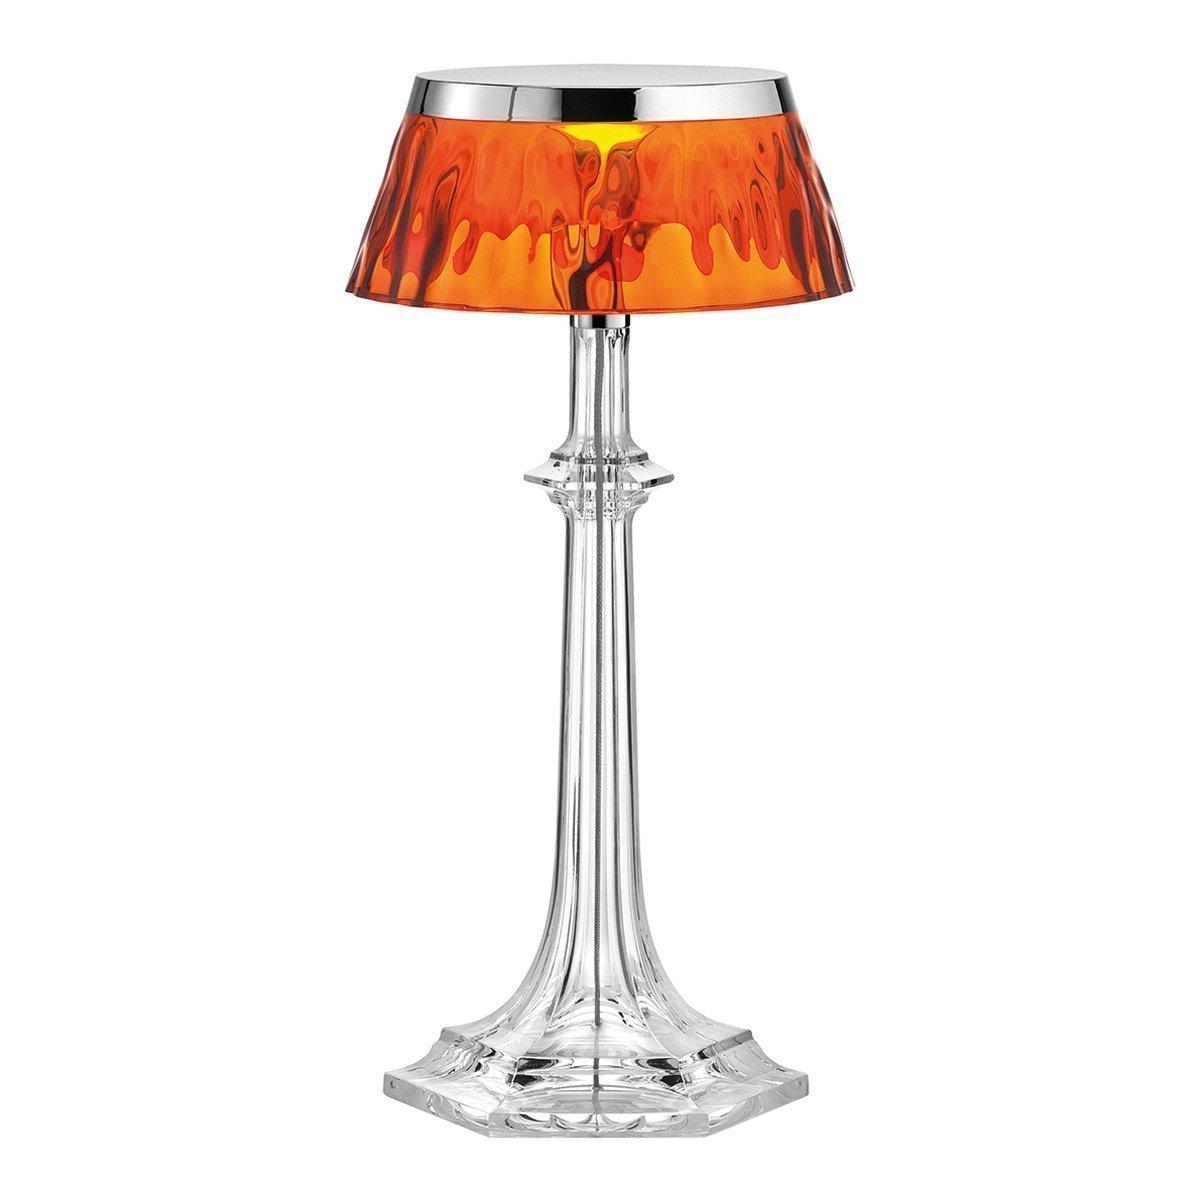 FLOS Bon Jour Versailles Small Tafellamp - Chroom - Amber